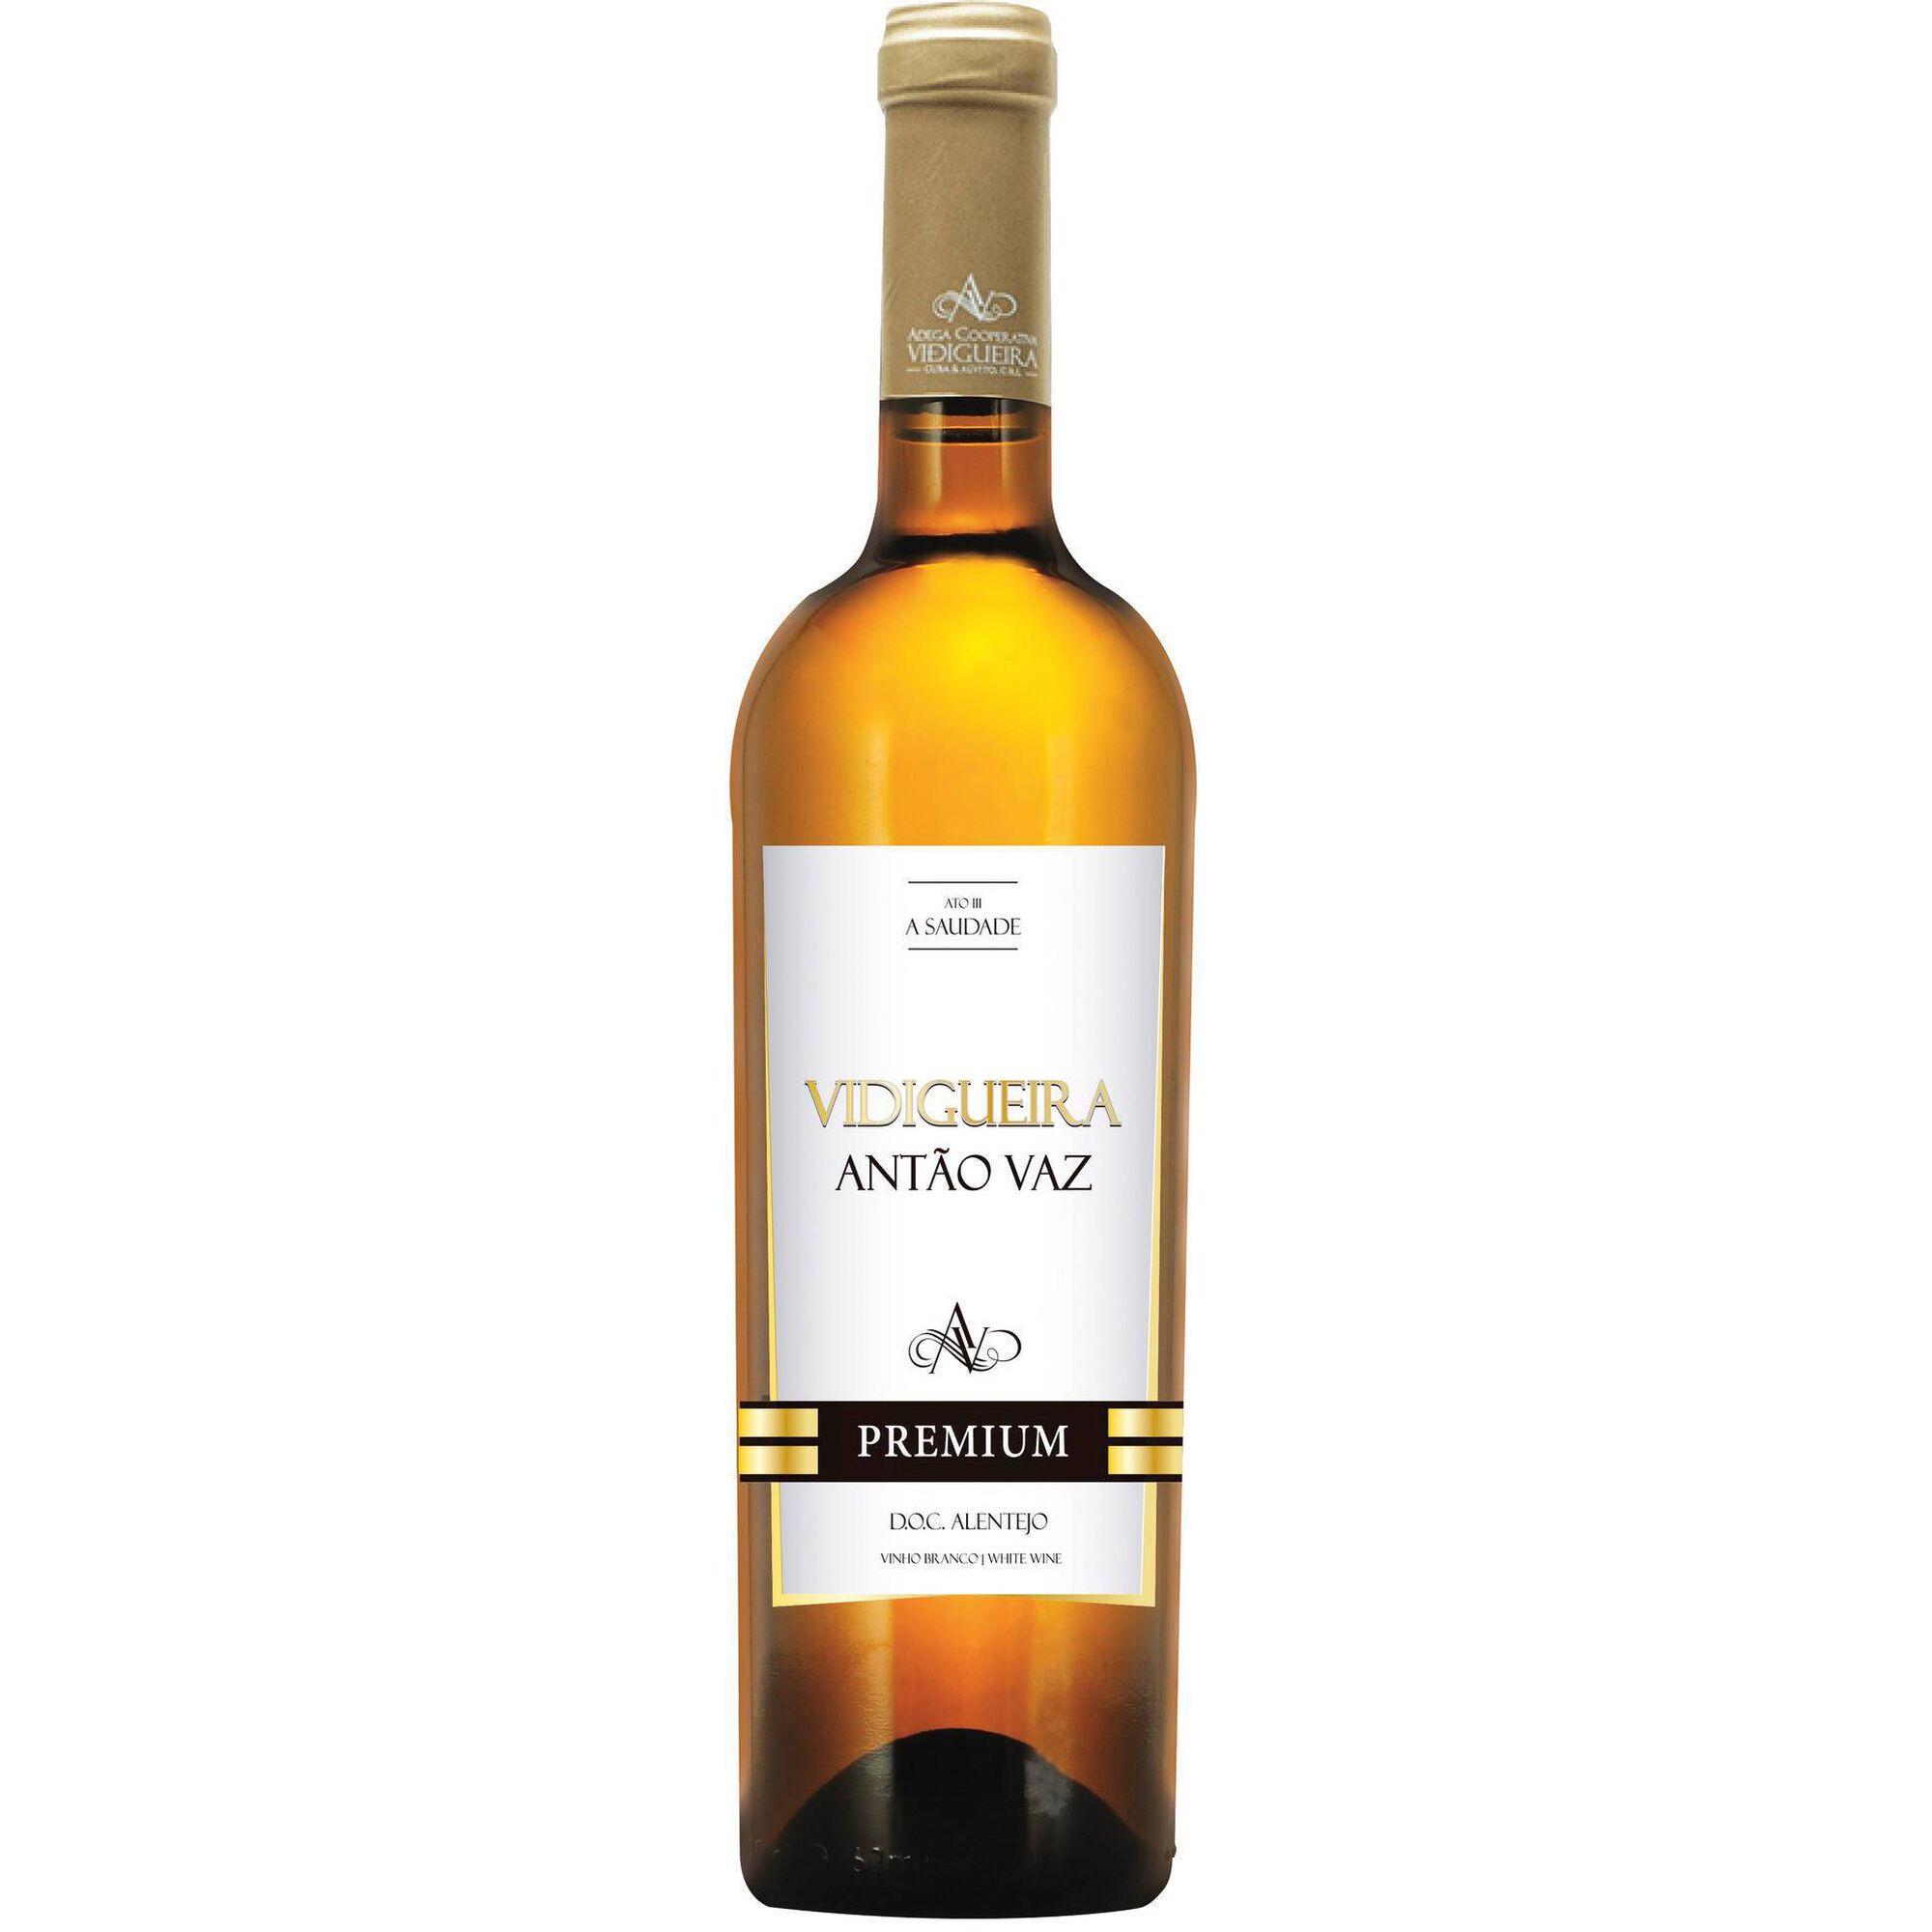 Vidigueira Antão Vaz Premium DOC Alentejo Vinho Branco